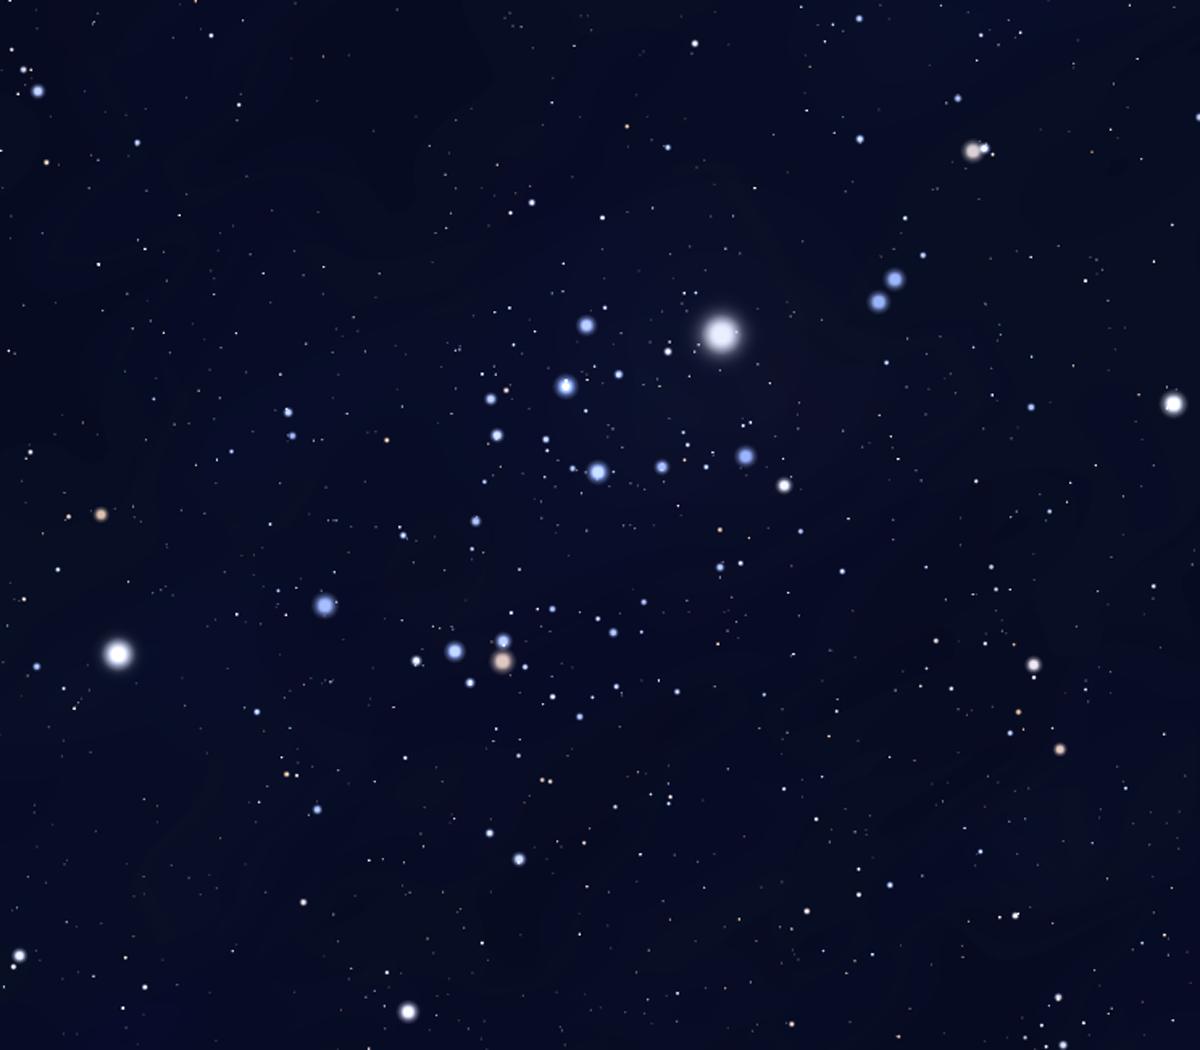 Nhóm sao di chuyển Alpha Persei. Hình minh họa bởi Stellarium.